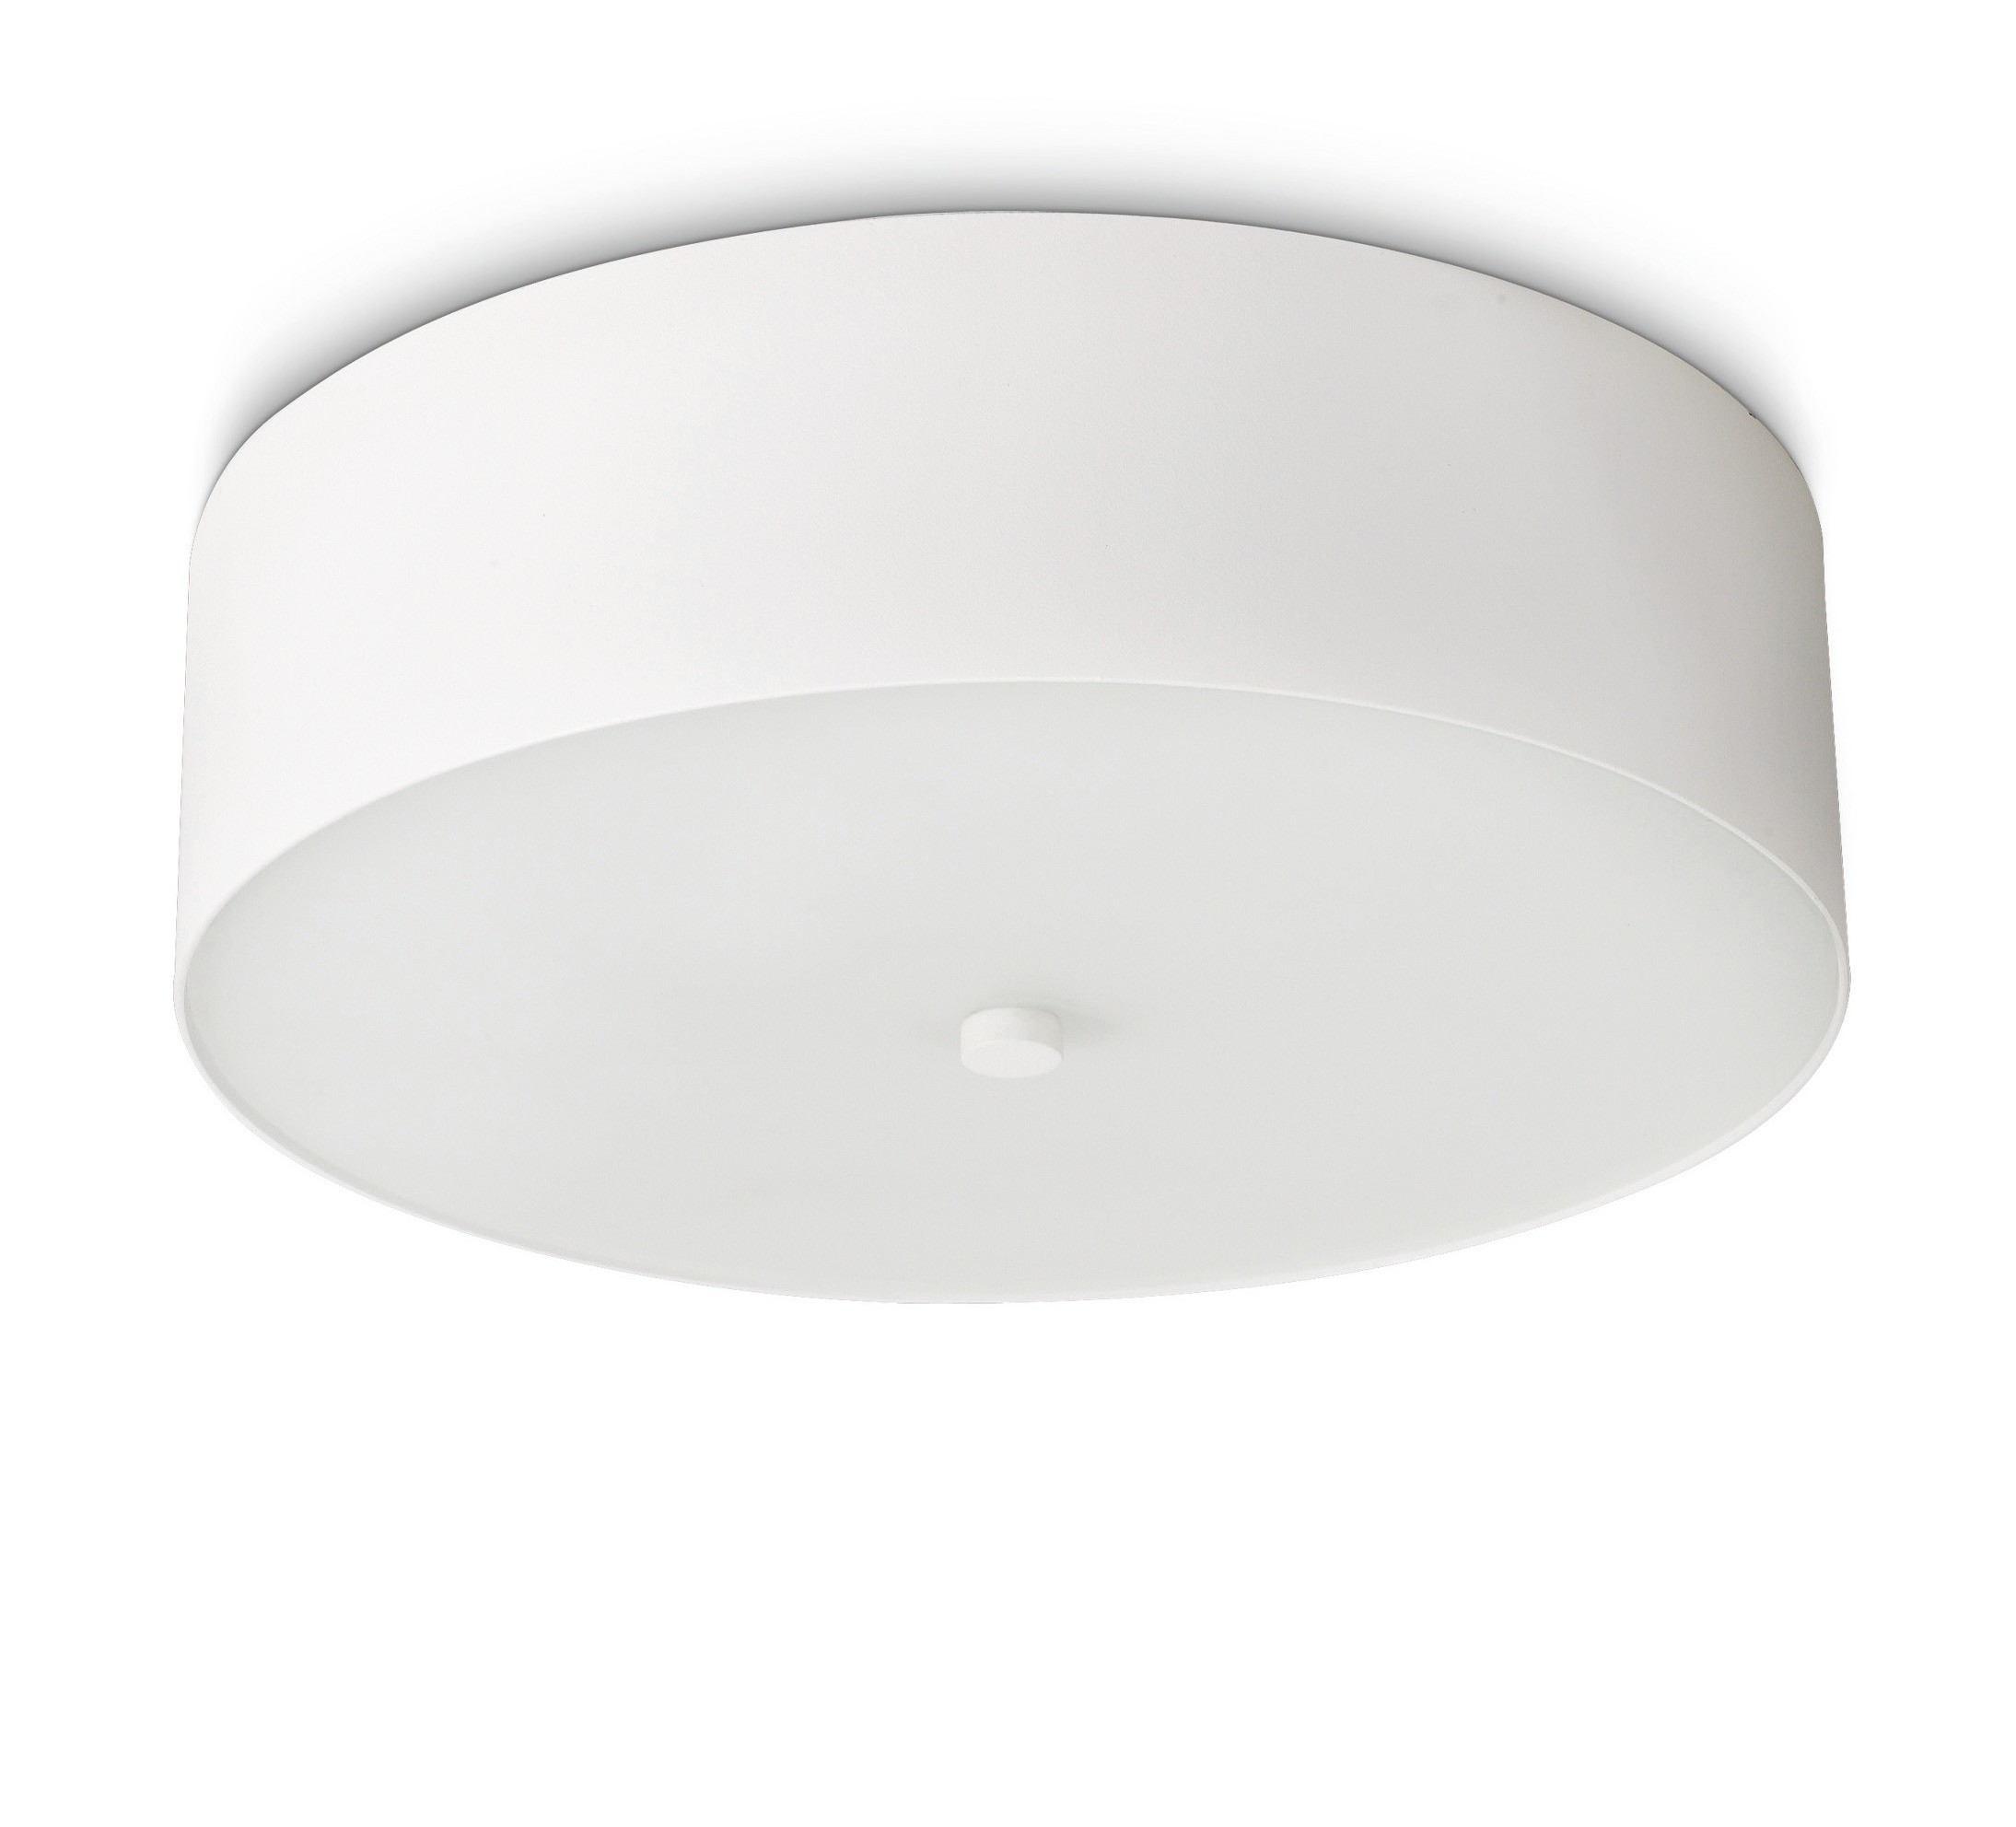 philips ledino sequens 408313116 led plafondlamp wit. Black Bedroom Furniture Sets. Home Design Ideas